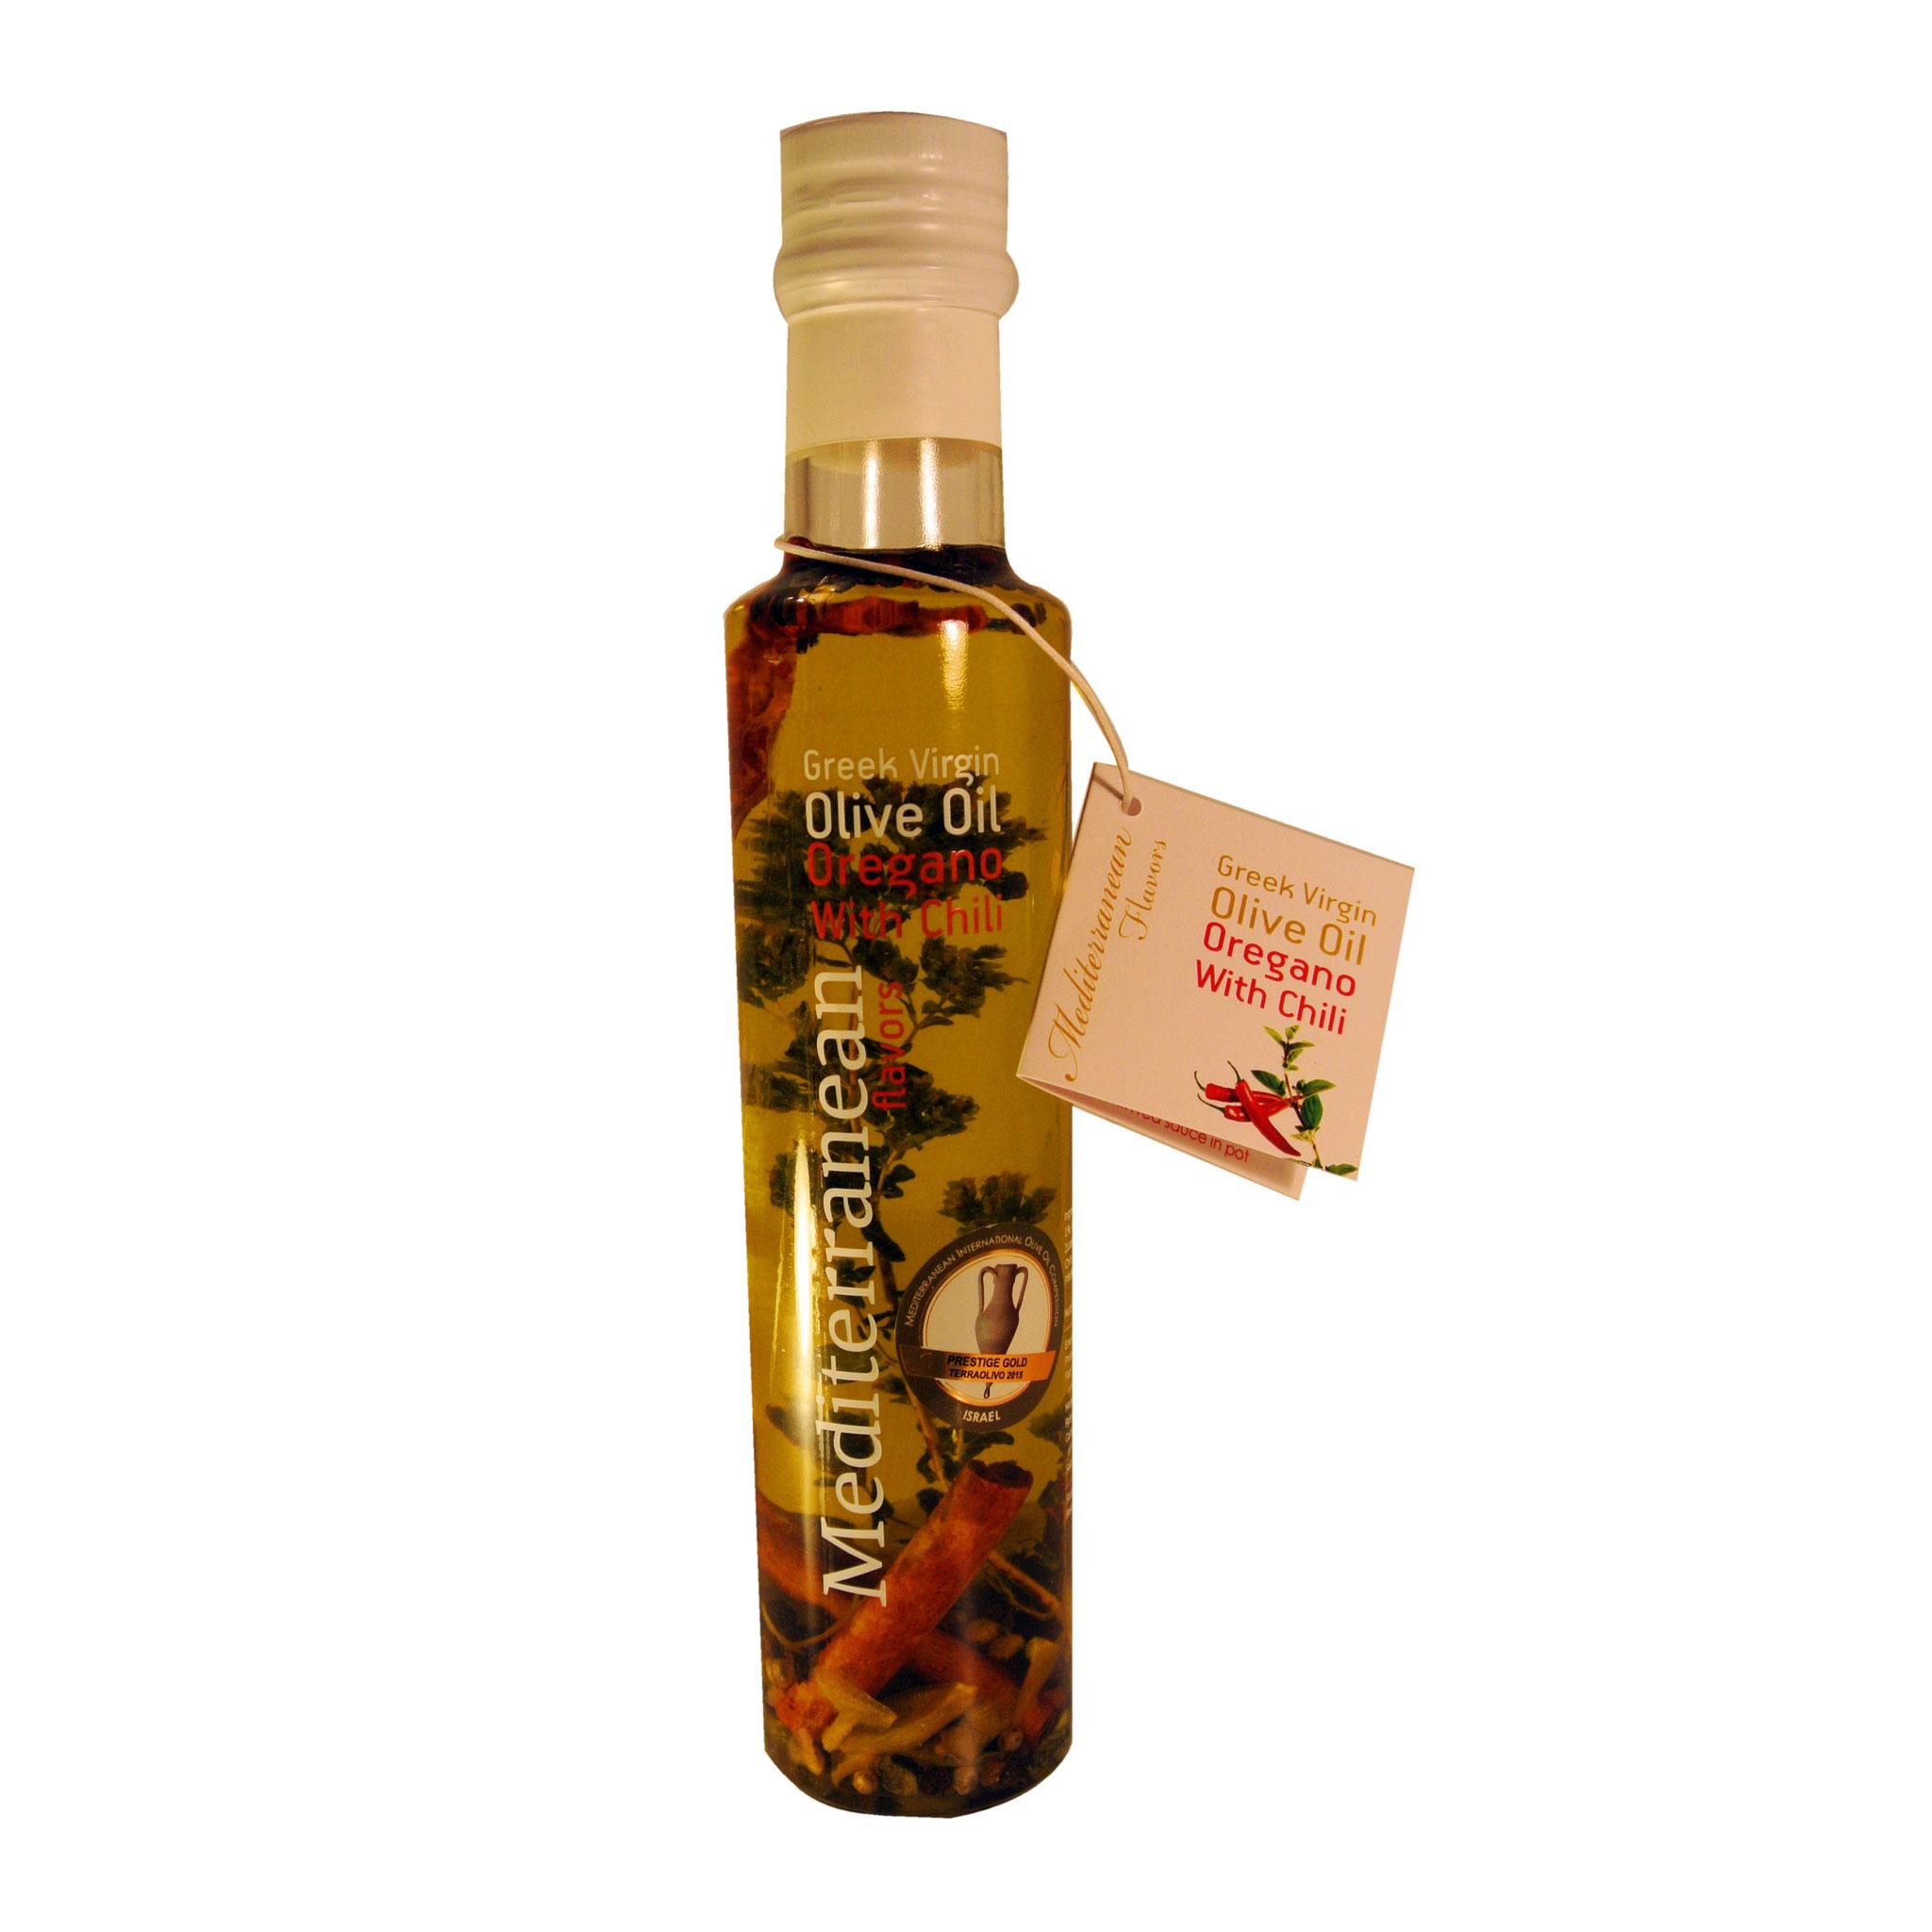 Mediterranean Flavors Παρθένο Ελαιόλαδο με Ρίγανη & Τσίλι 250ml | Nature Blessed